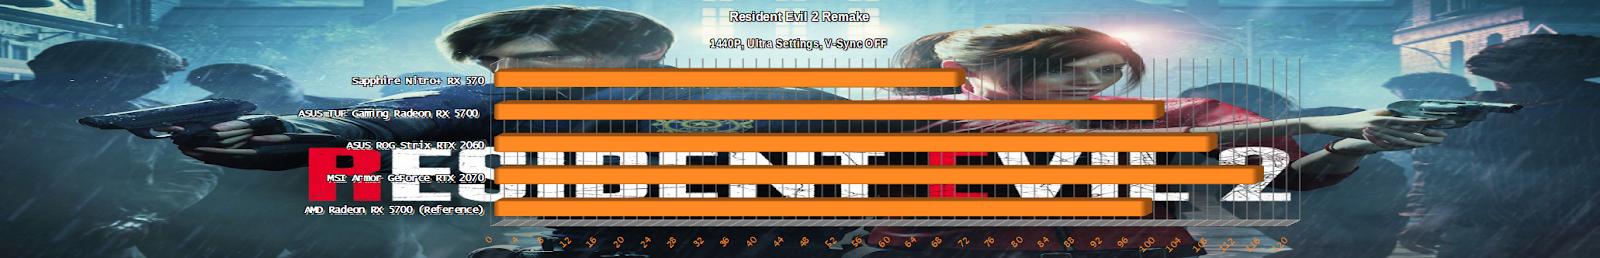 AMD Radeon RX 5700 Review Benchmark